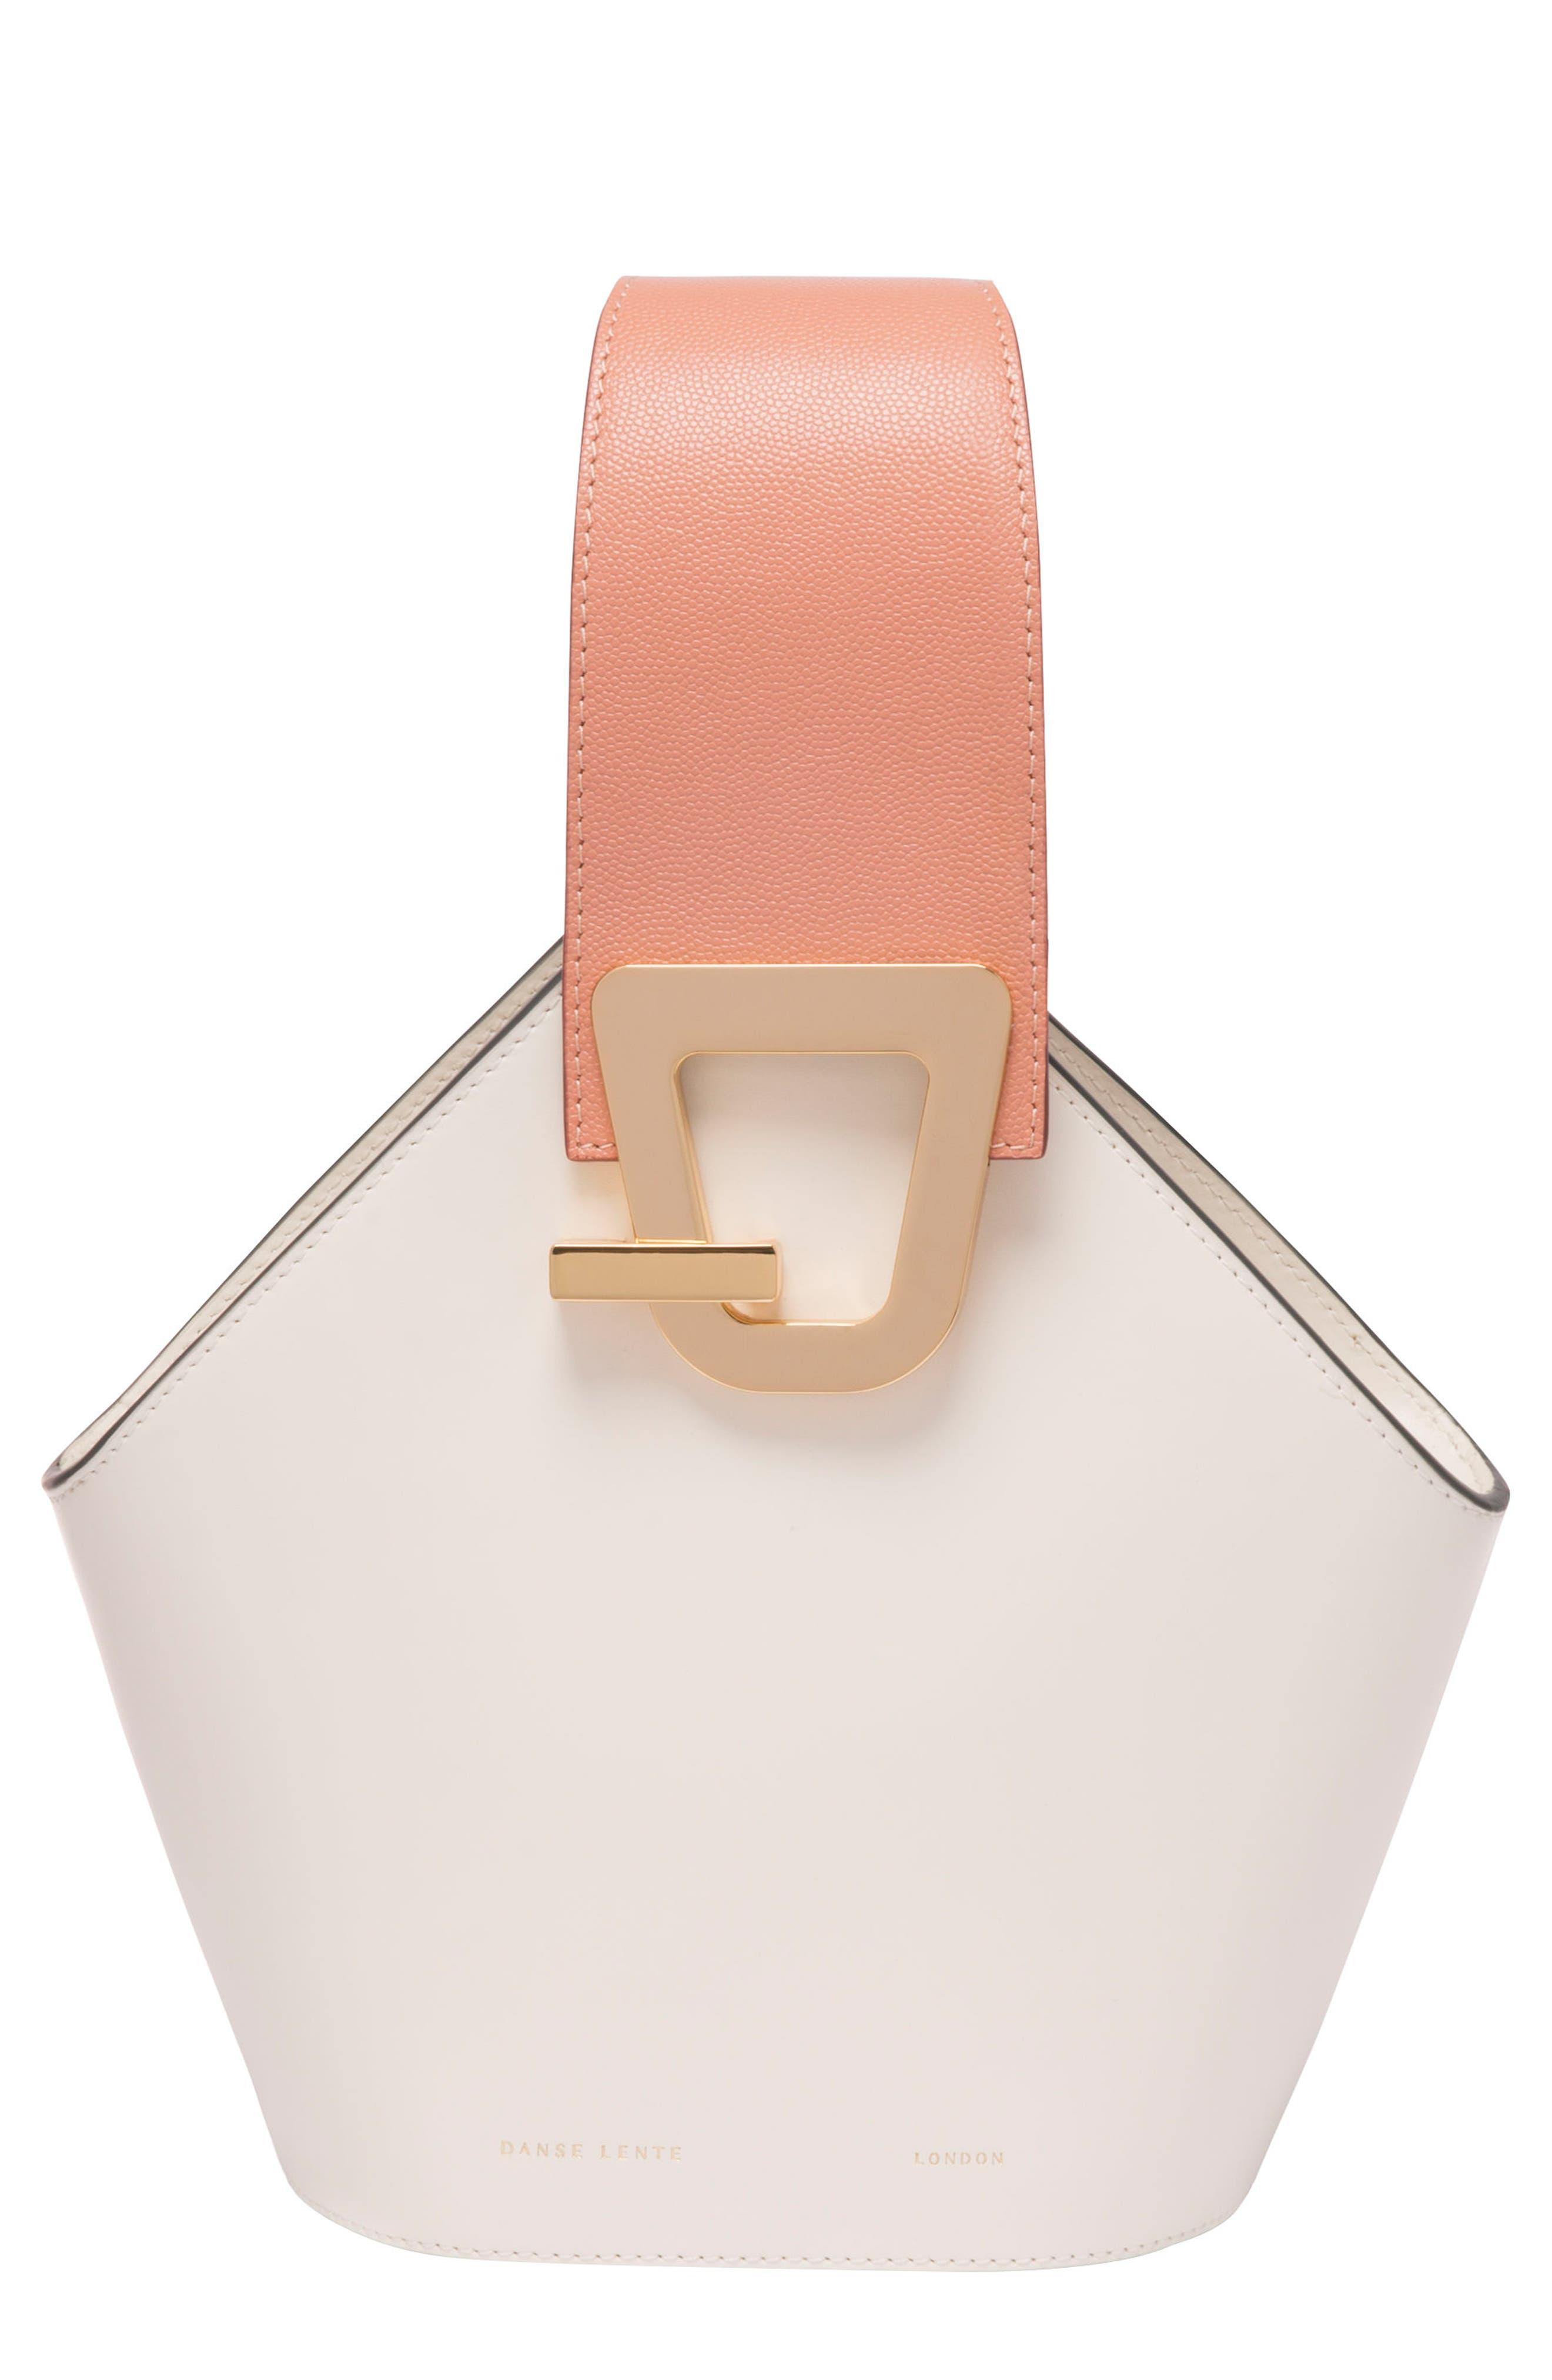 Mini Johnny Leather Bucket Bag,                             Main thumbnail 1, color,                             101